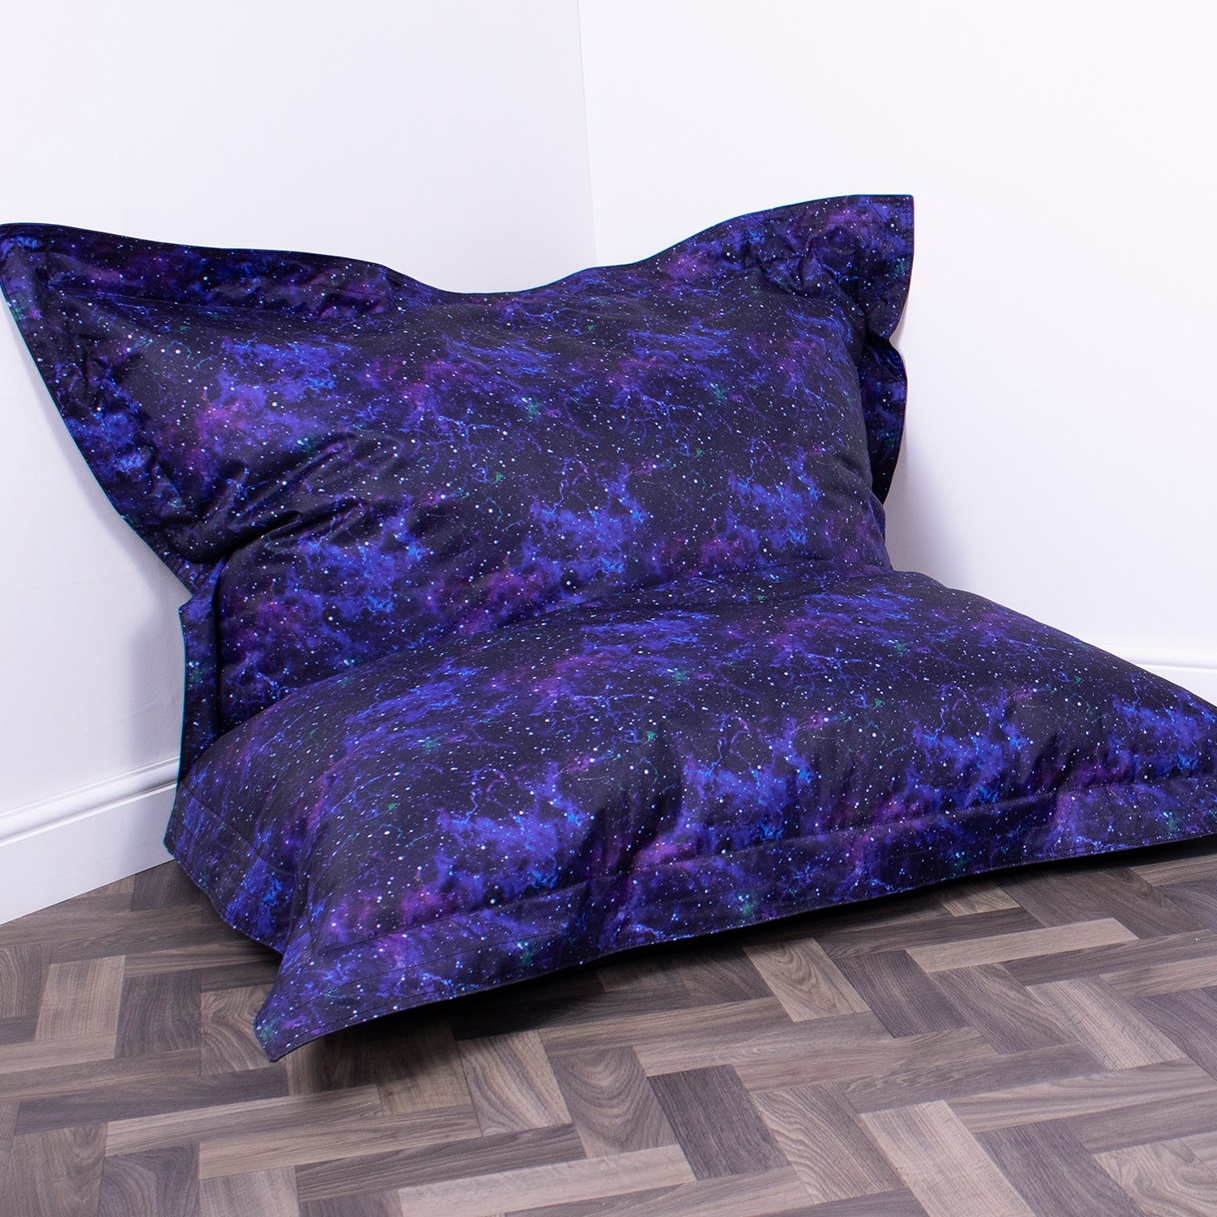 Eden-Galaxy-Print-Floor-Cushion-large.jpg